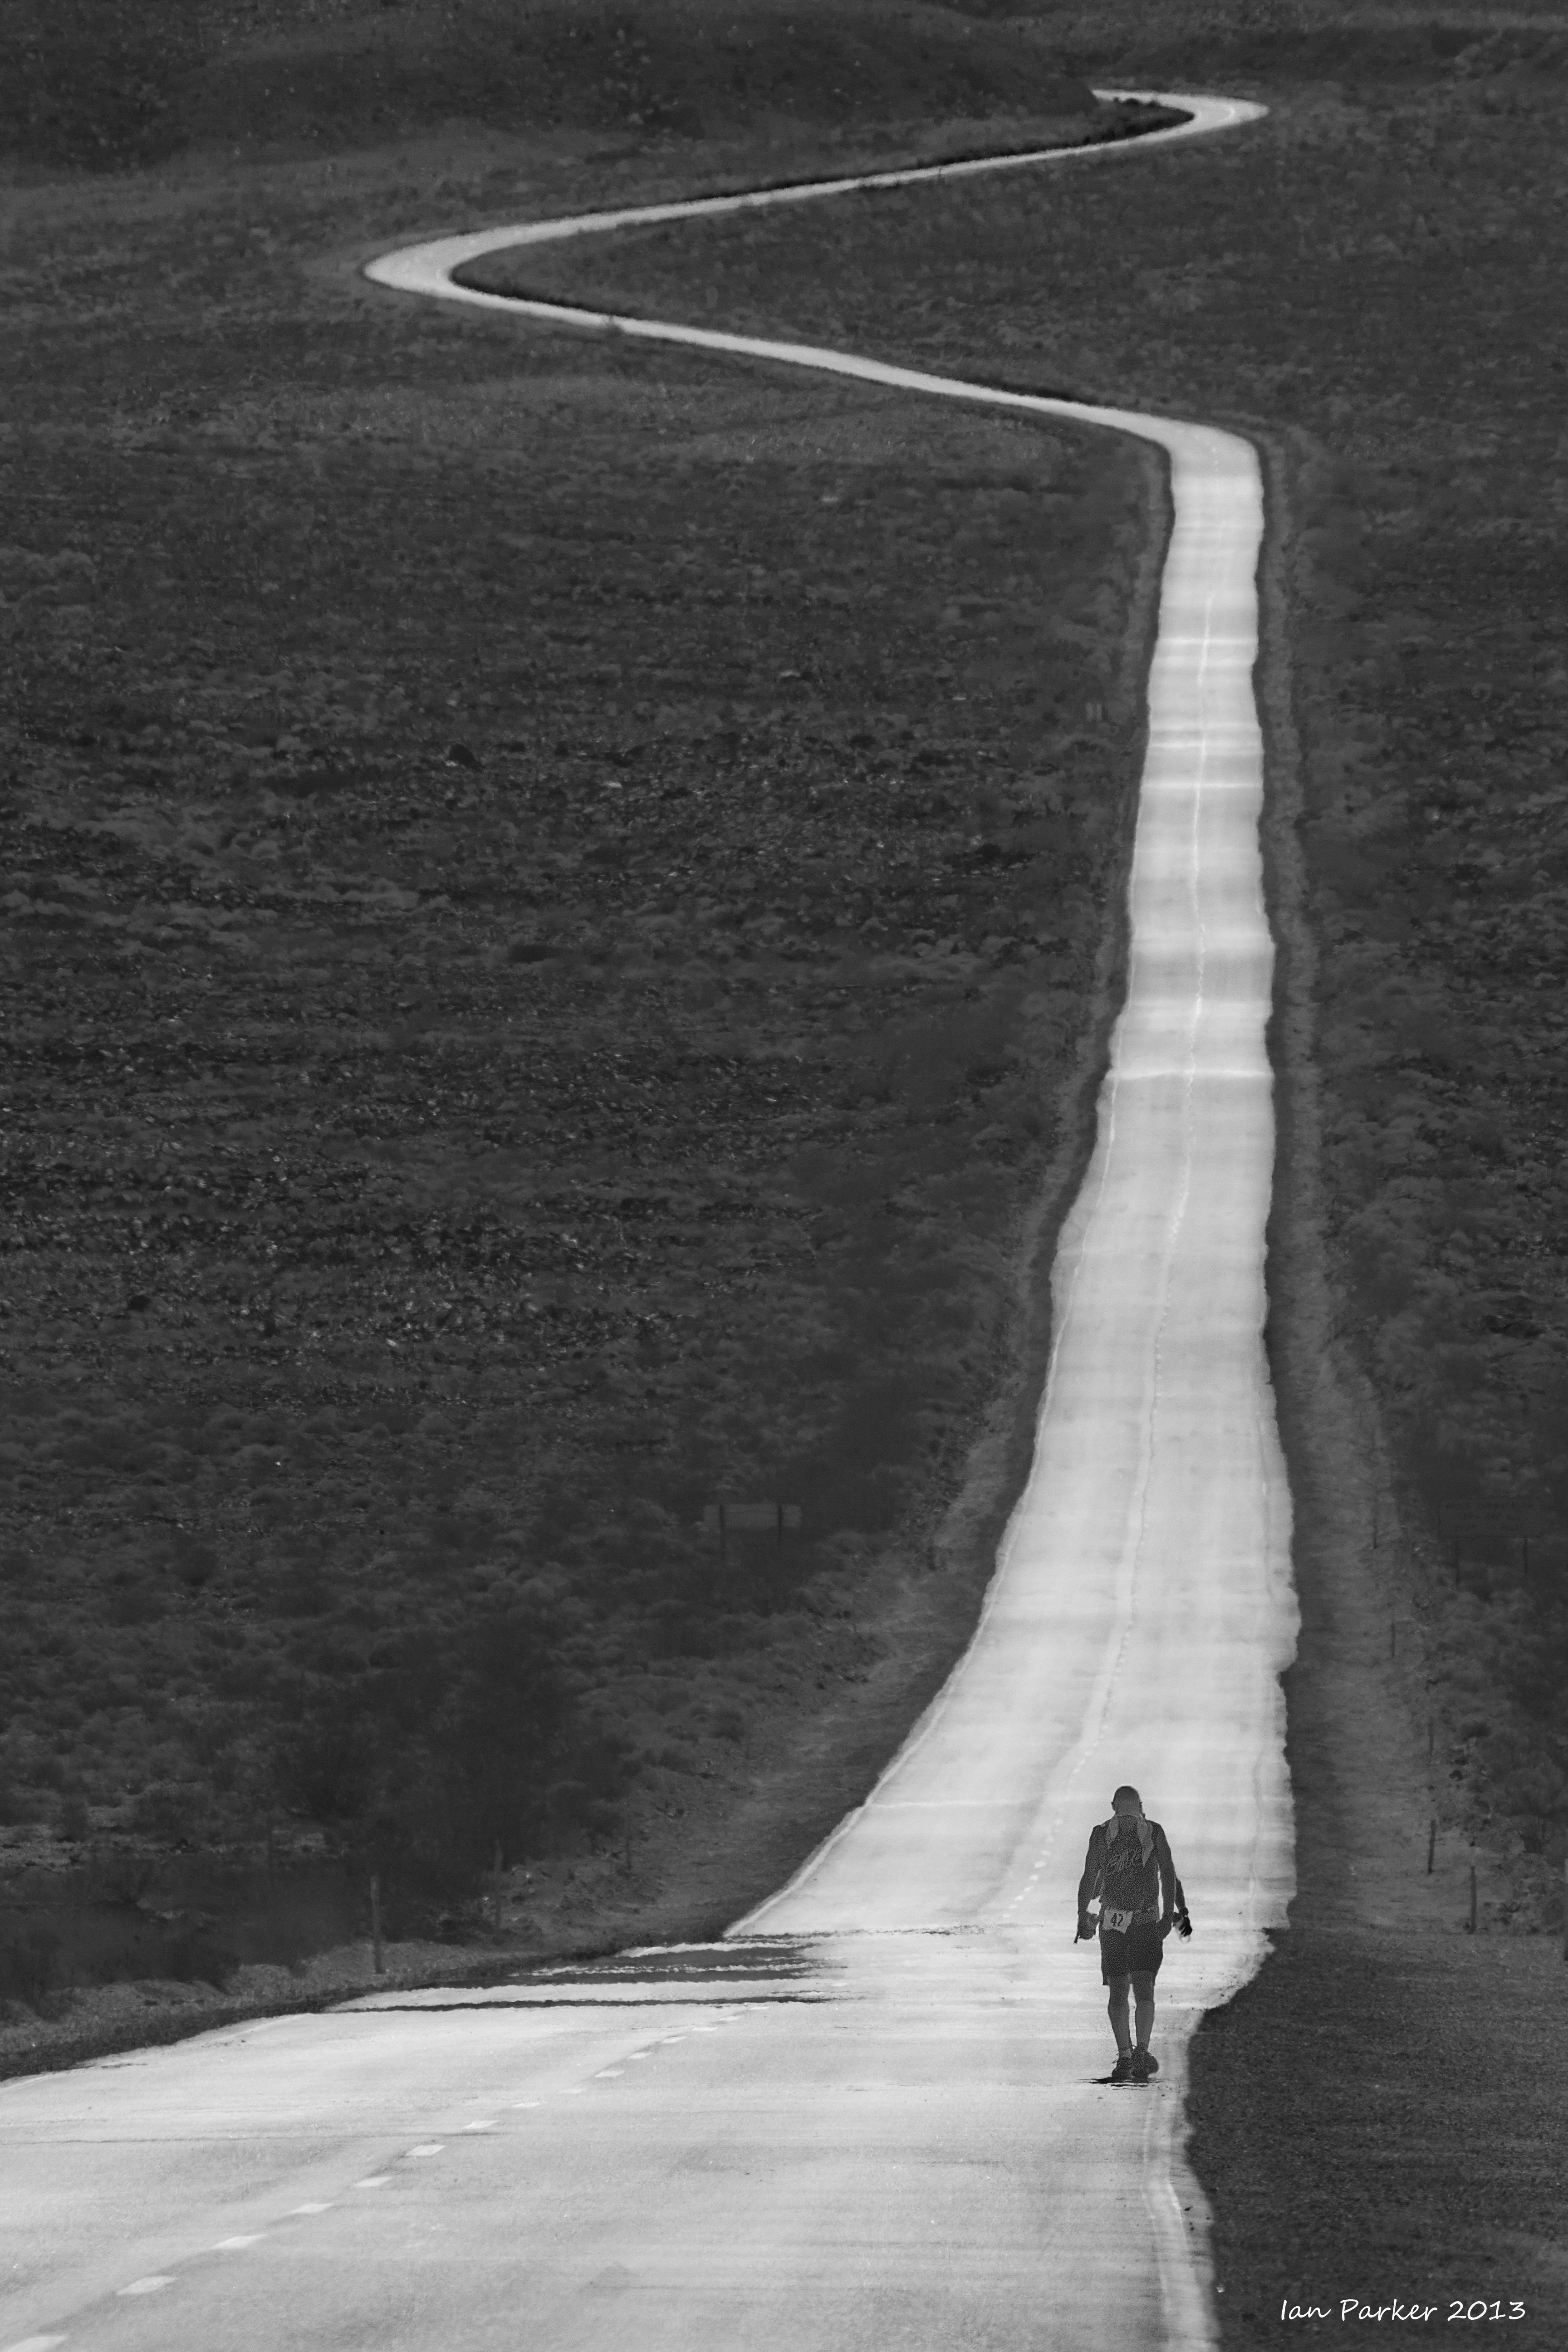 Evanescent Light : Roads